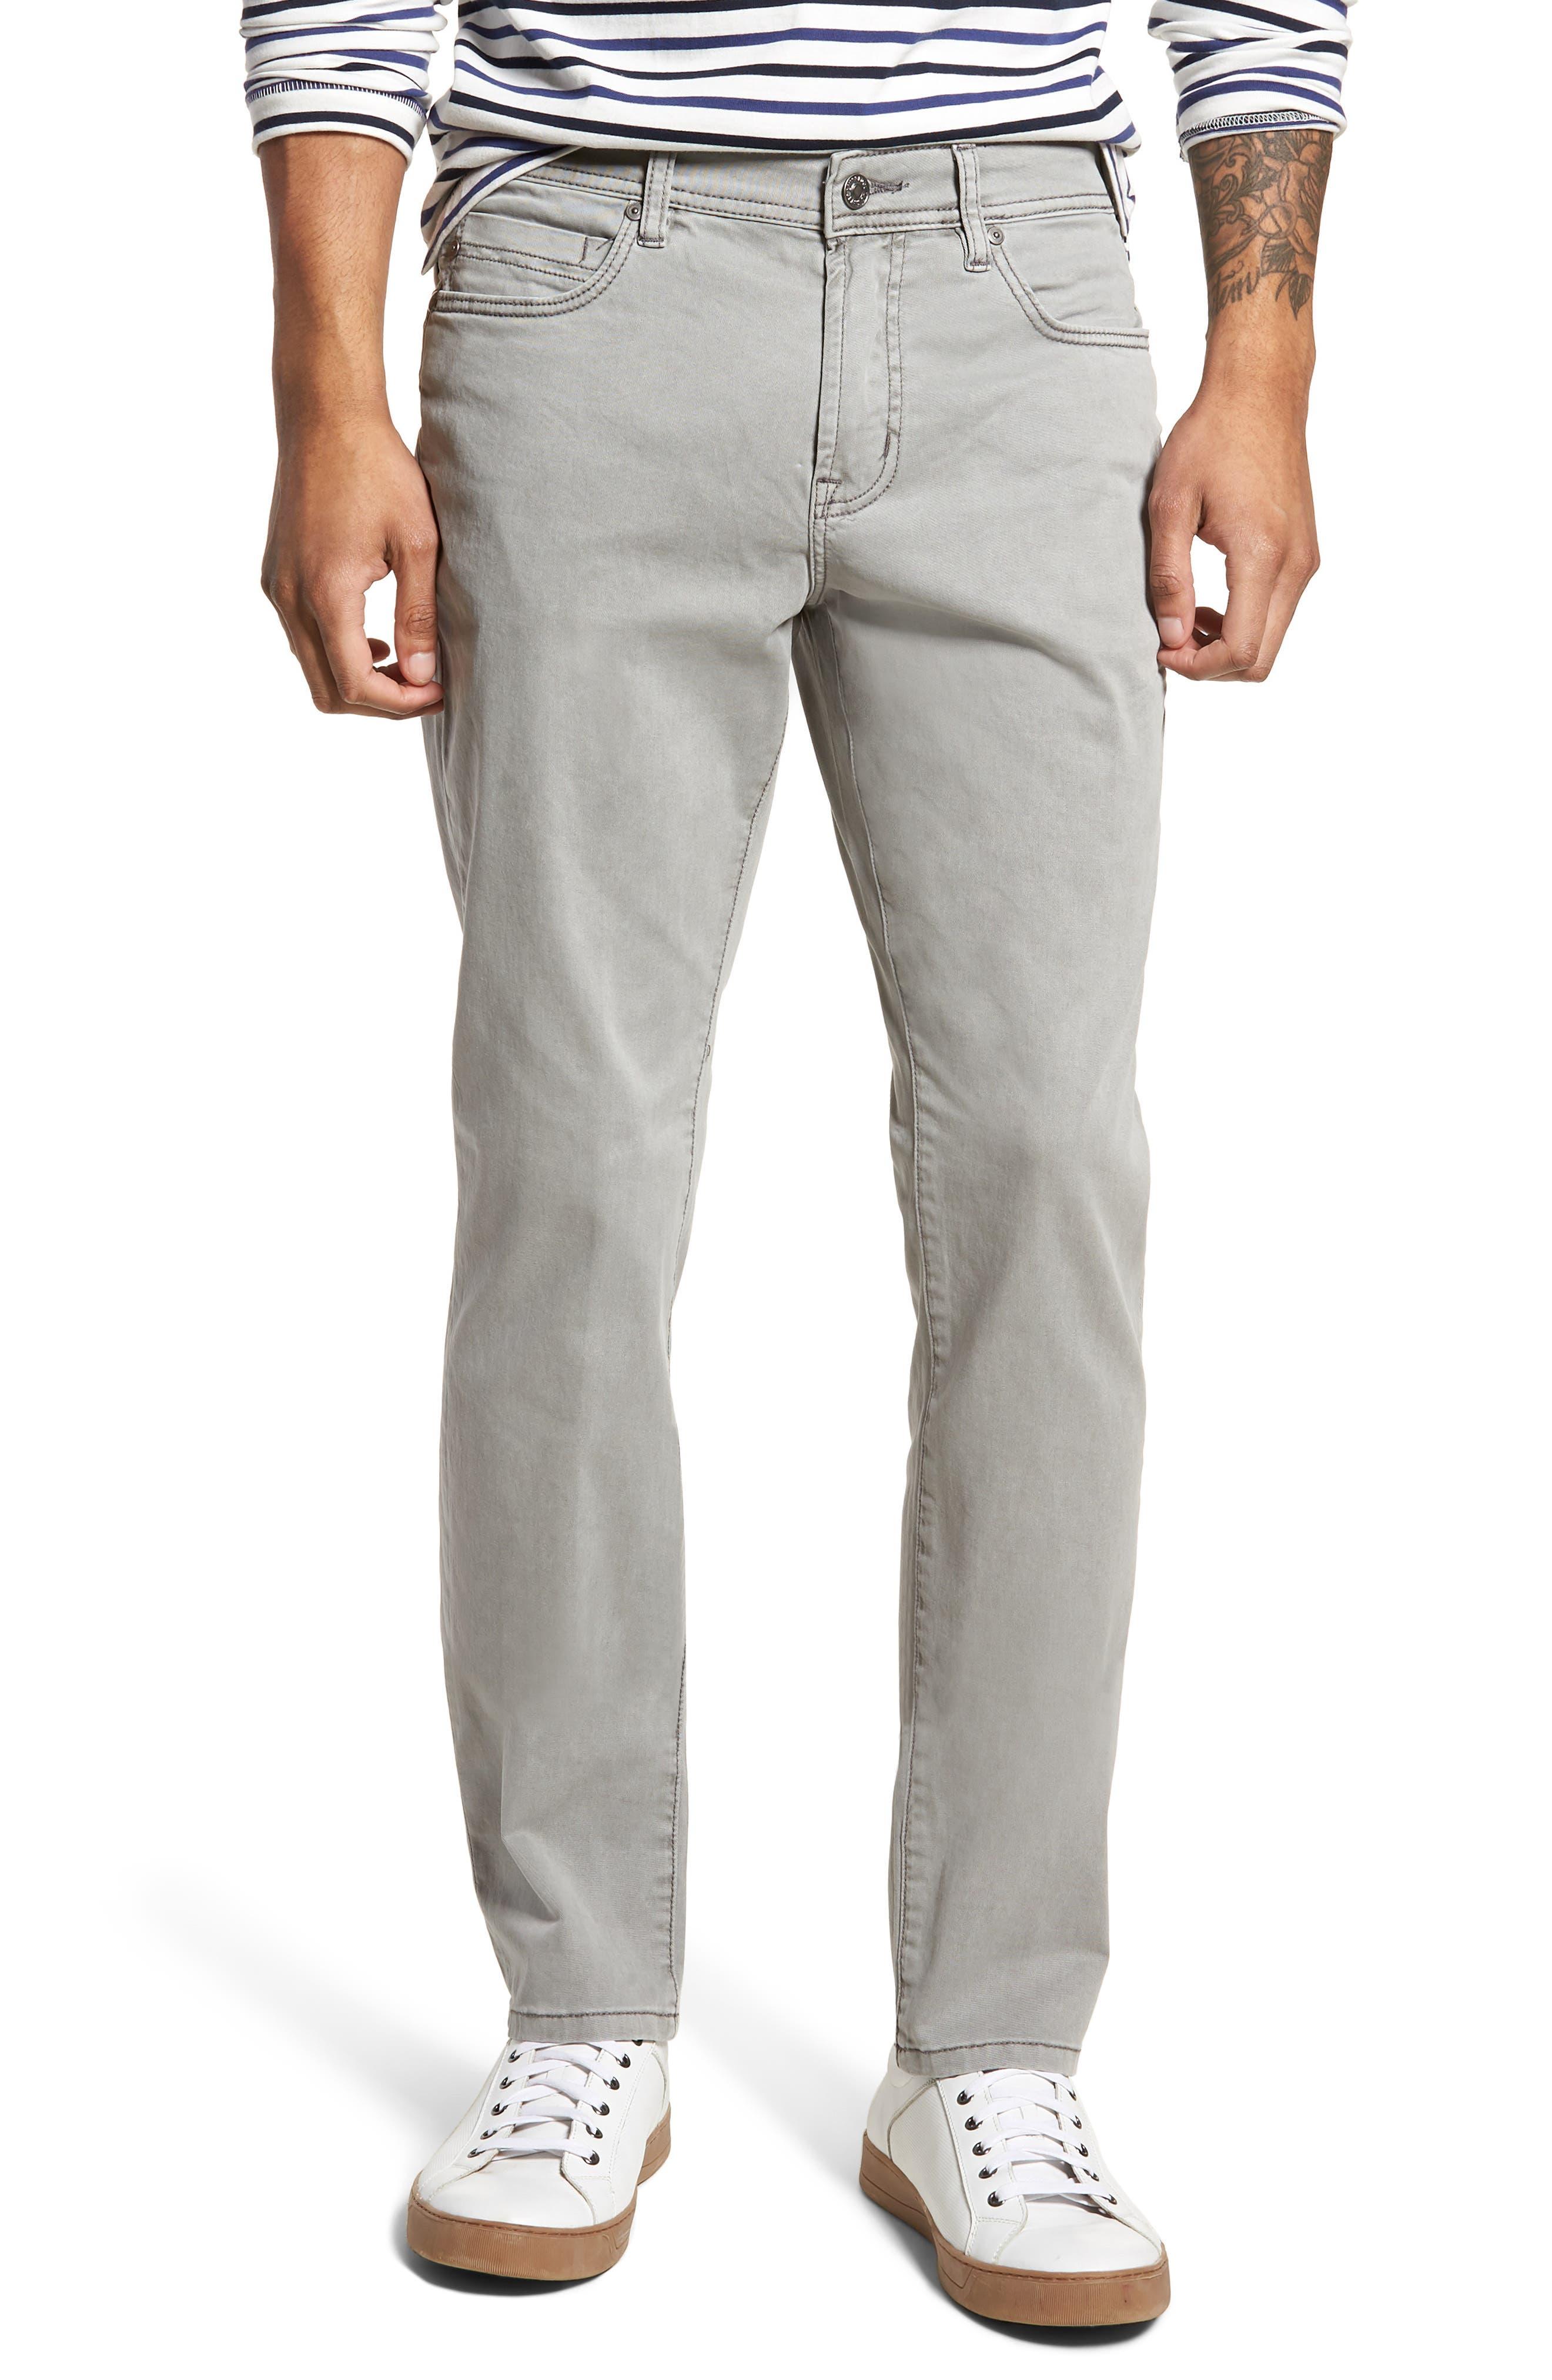 Jeans Co. Slim Straight Leg Jeans,                         Main,                         color, SHARKSKIN